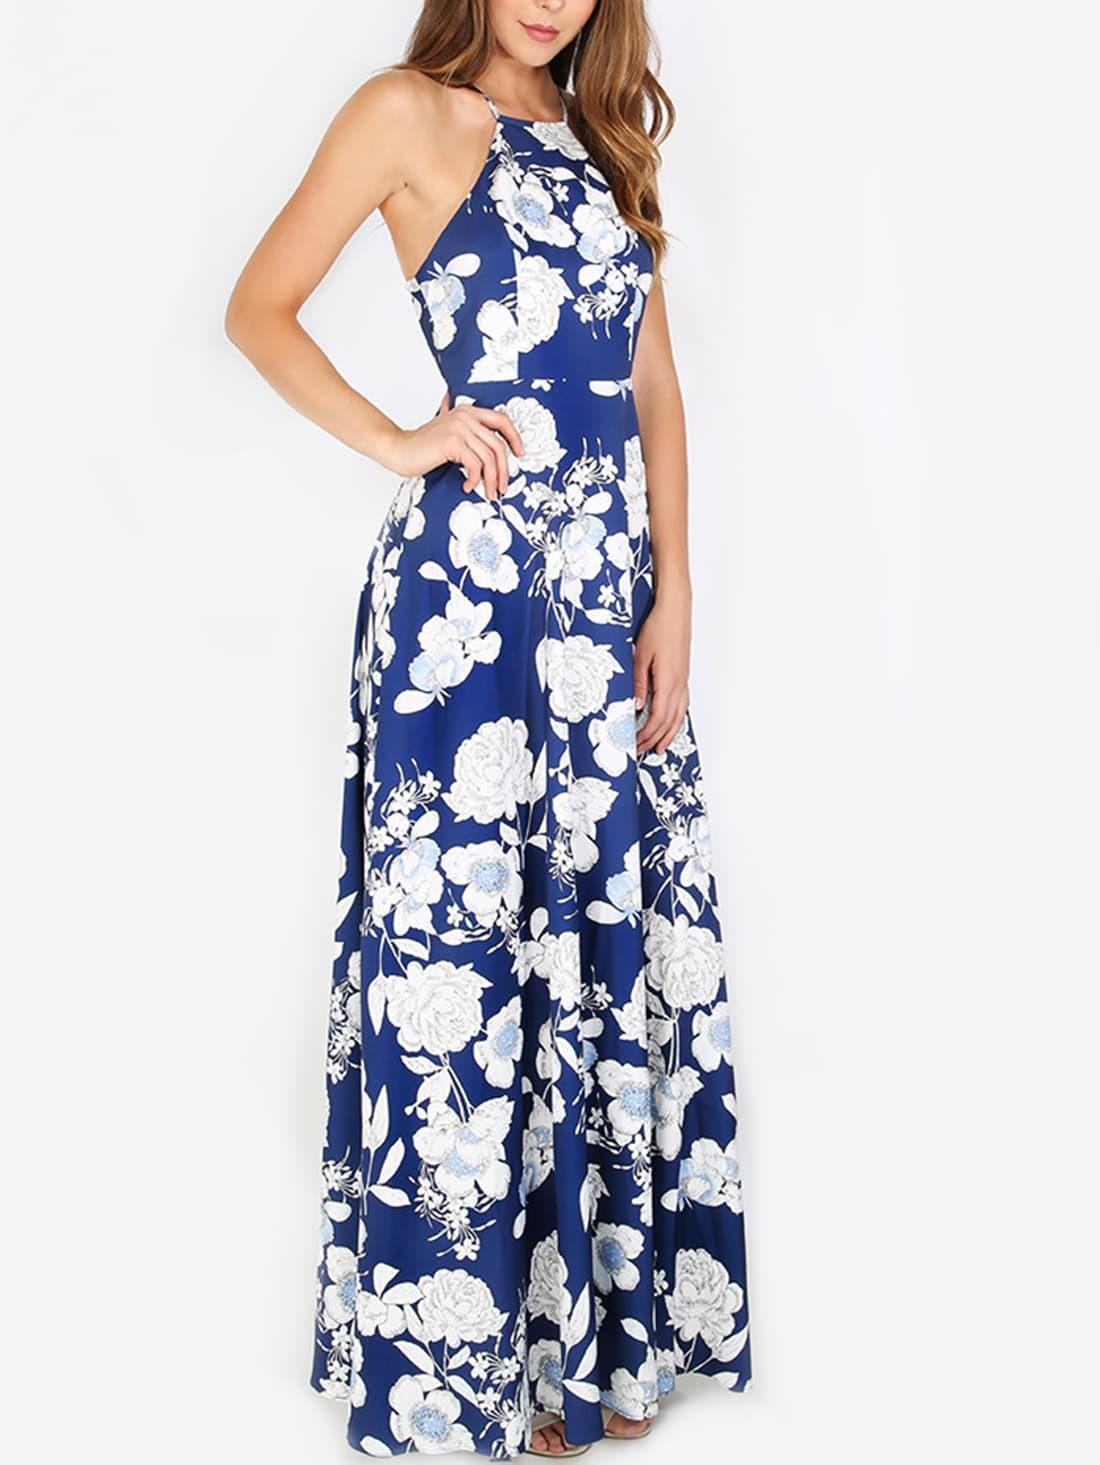 Halterneck Floral Print Maxi Dress -SheIn(Sheinside)